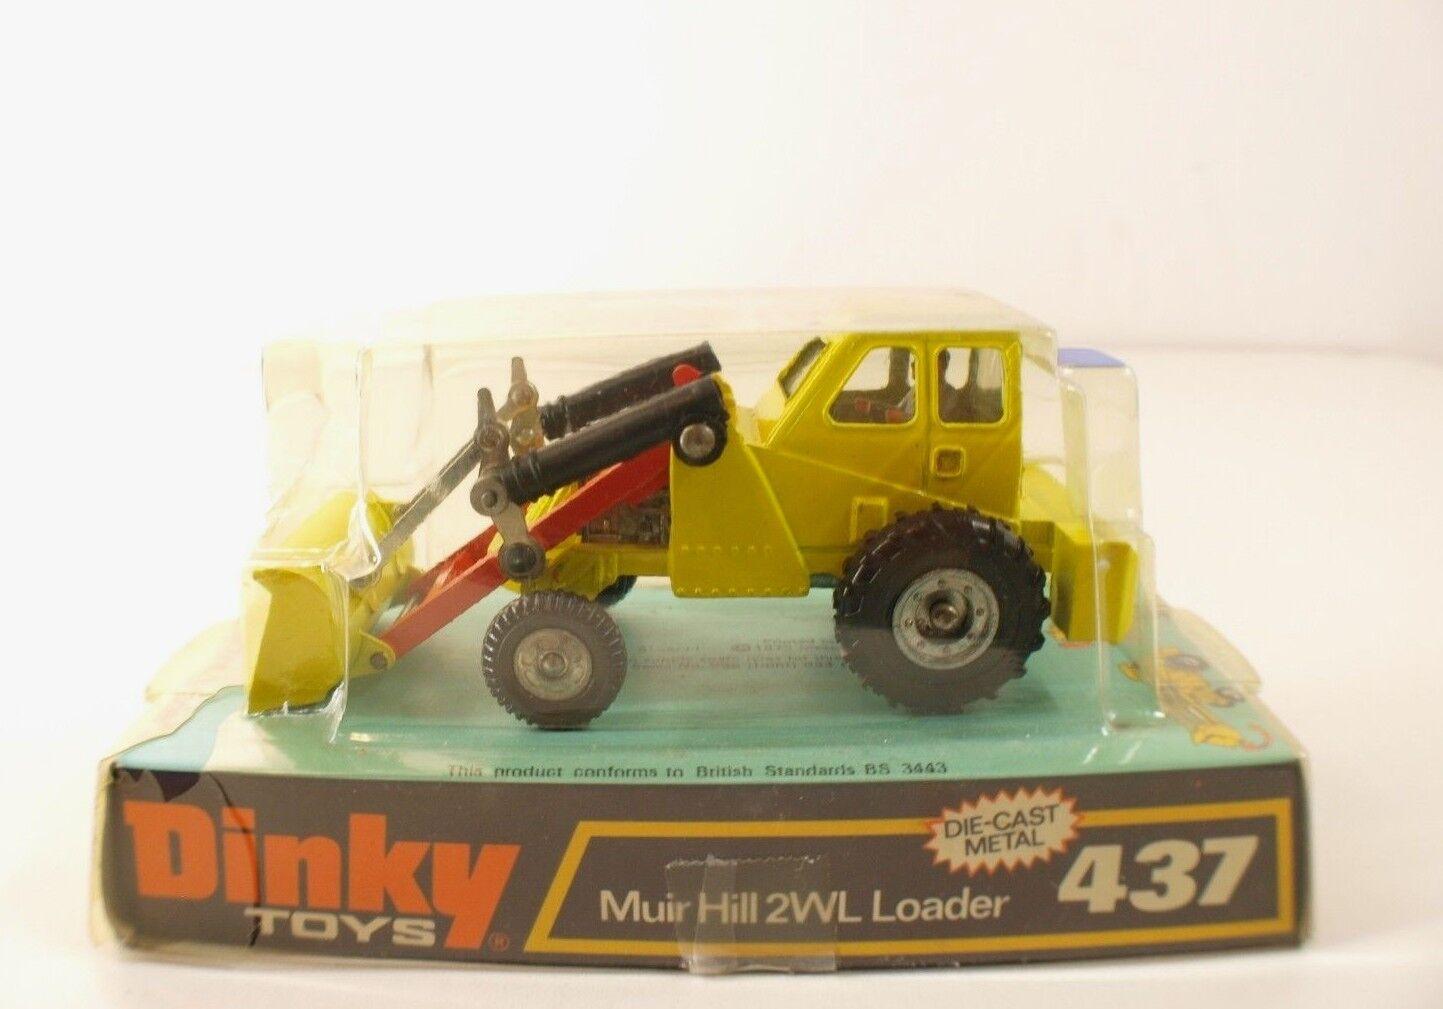 distribución global Dinky Juguetes GB GB GB N.437 Muir-Collina 2WL Cuscinetto Trattore in Scatola Nmib  mejor marca